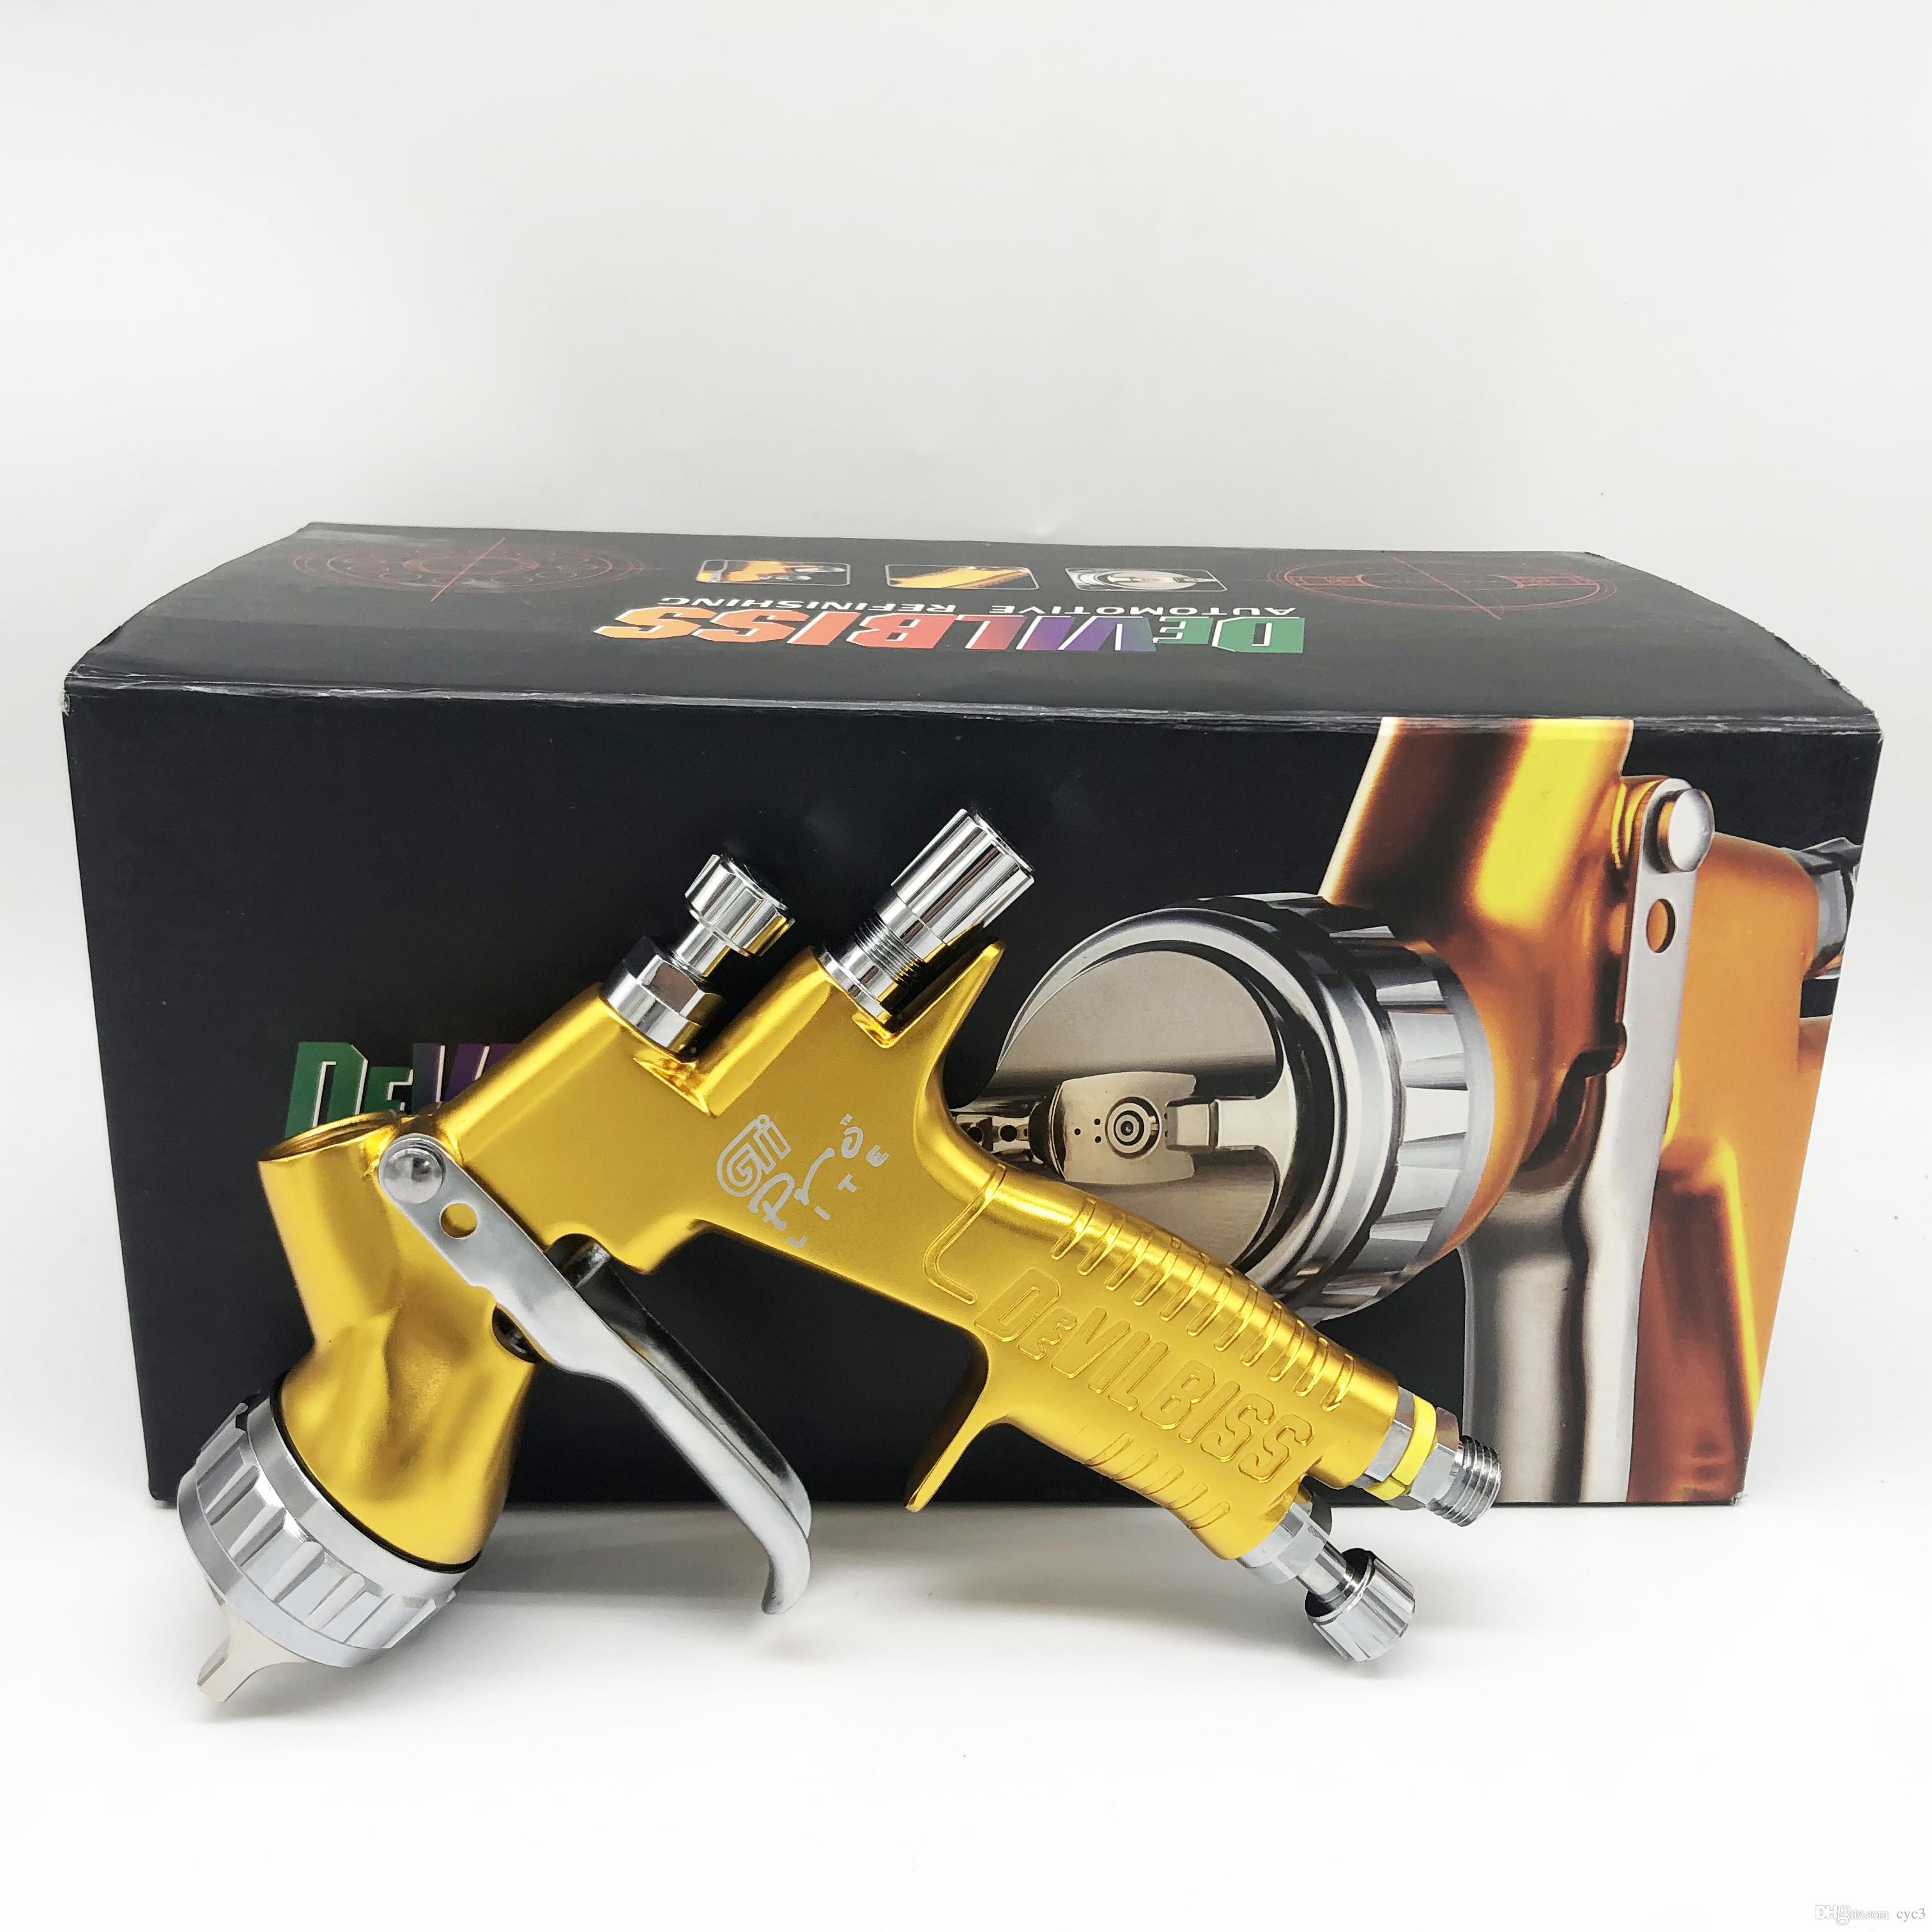 DeVilbiss pistola de pintura GTI pro TE20 / T110 Airbrush arma airless spray para pintar carros